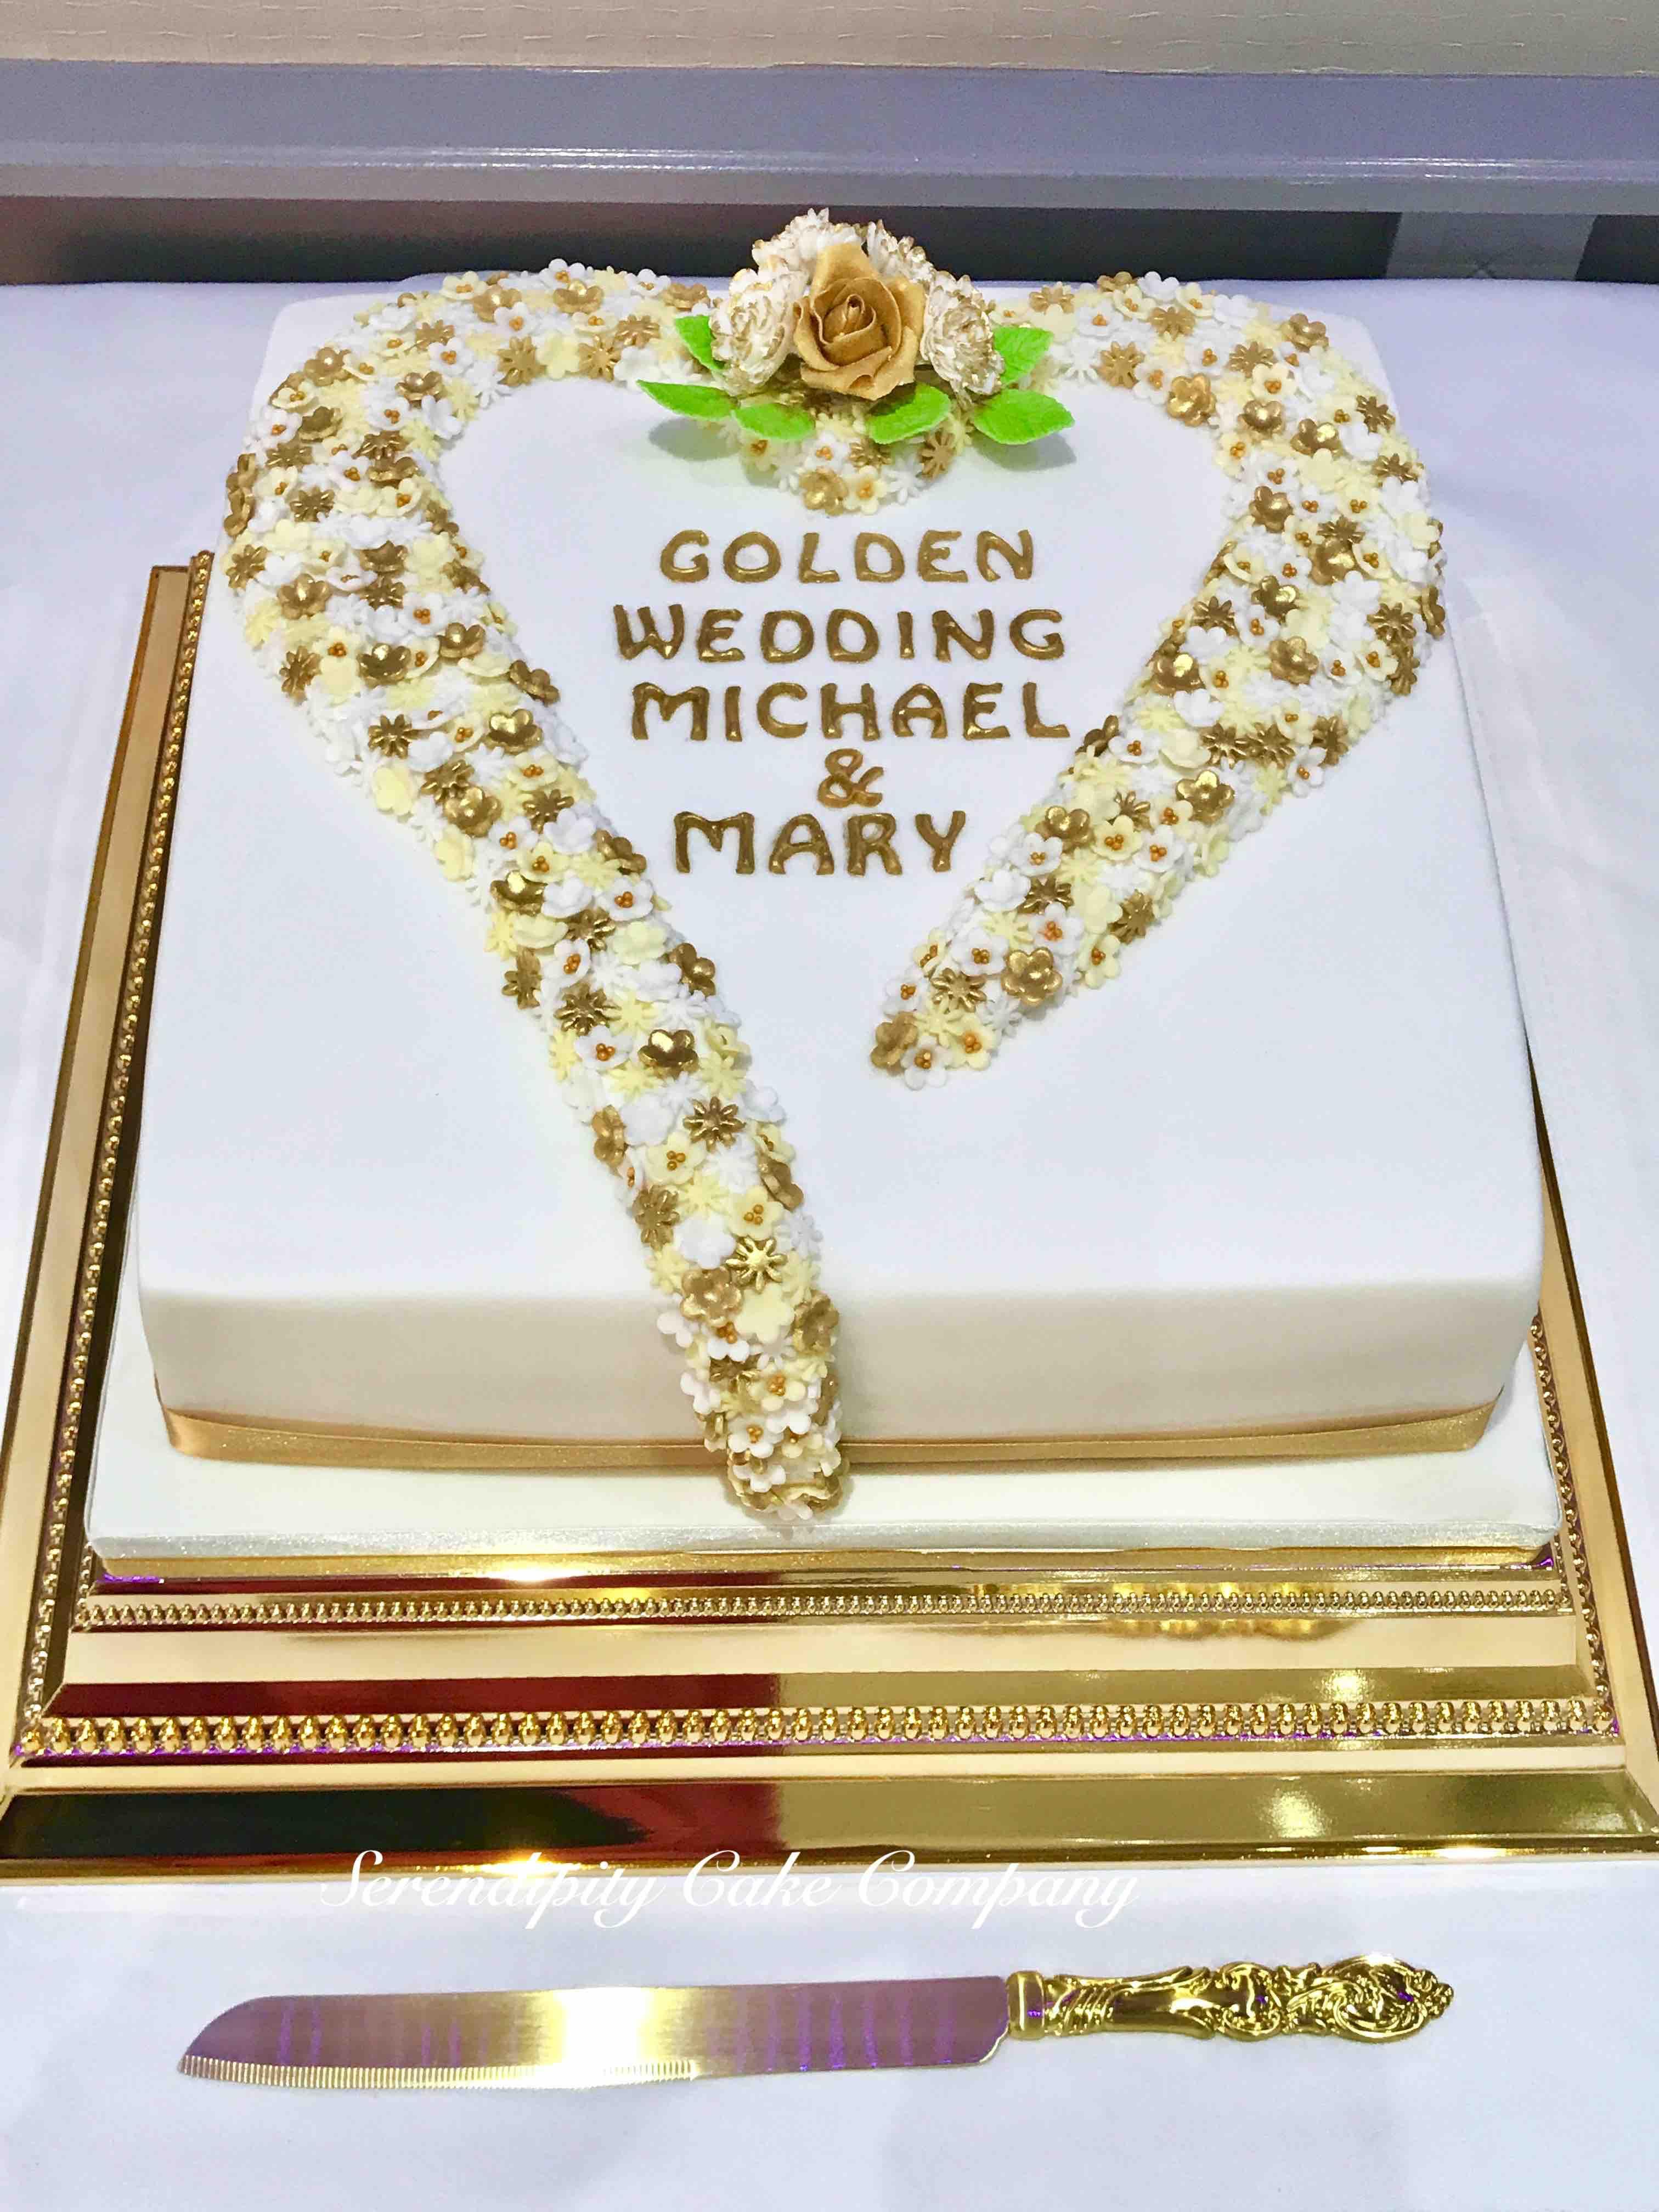 Golden Wedding Anniversary Cake by Serendipity Cake Company ...